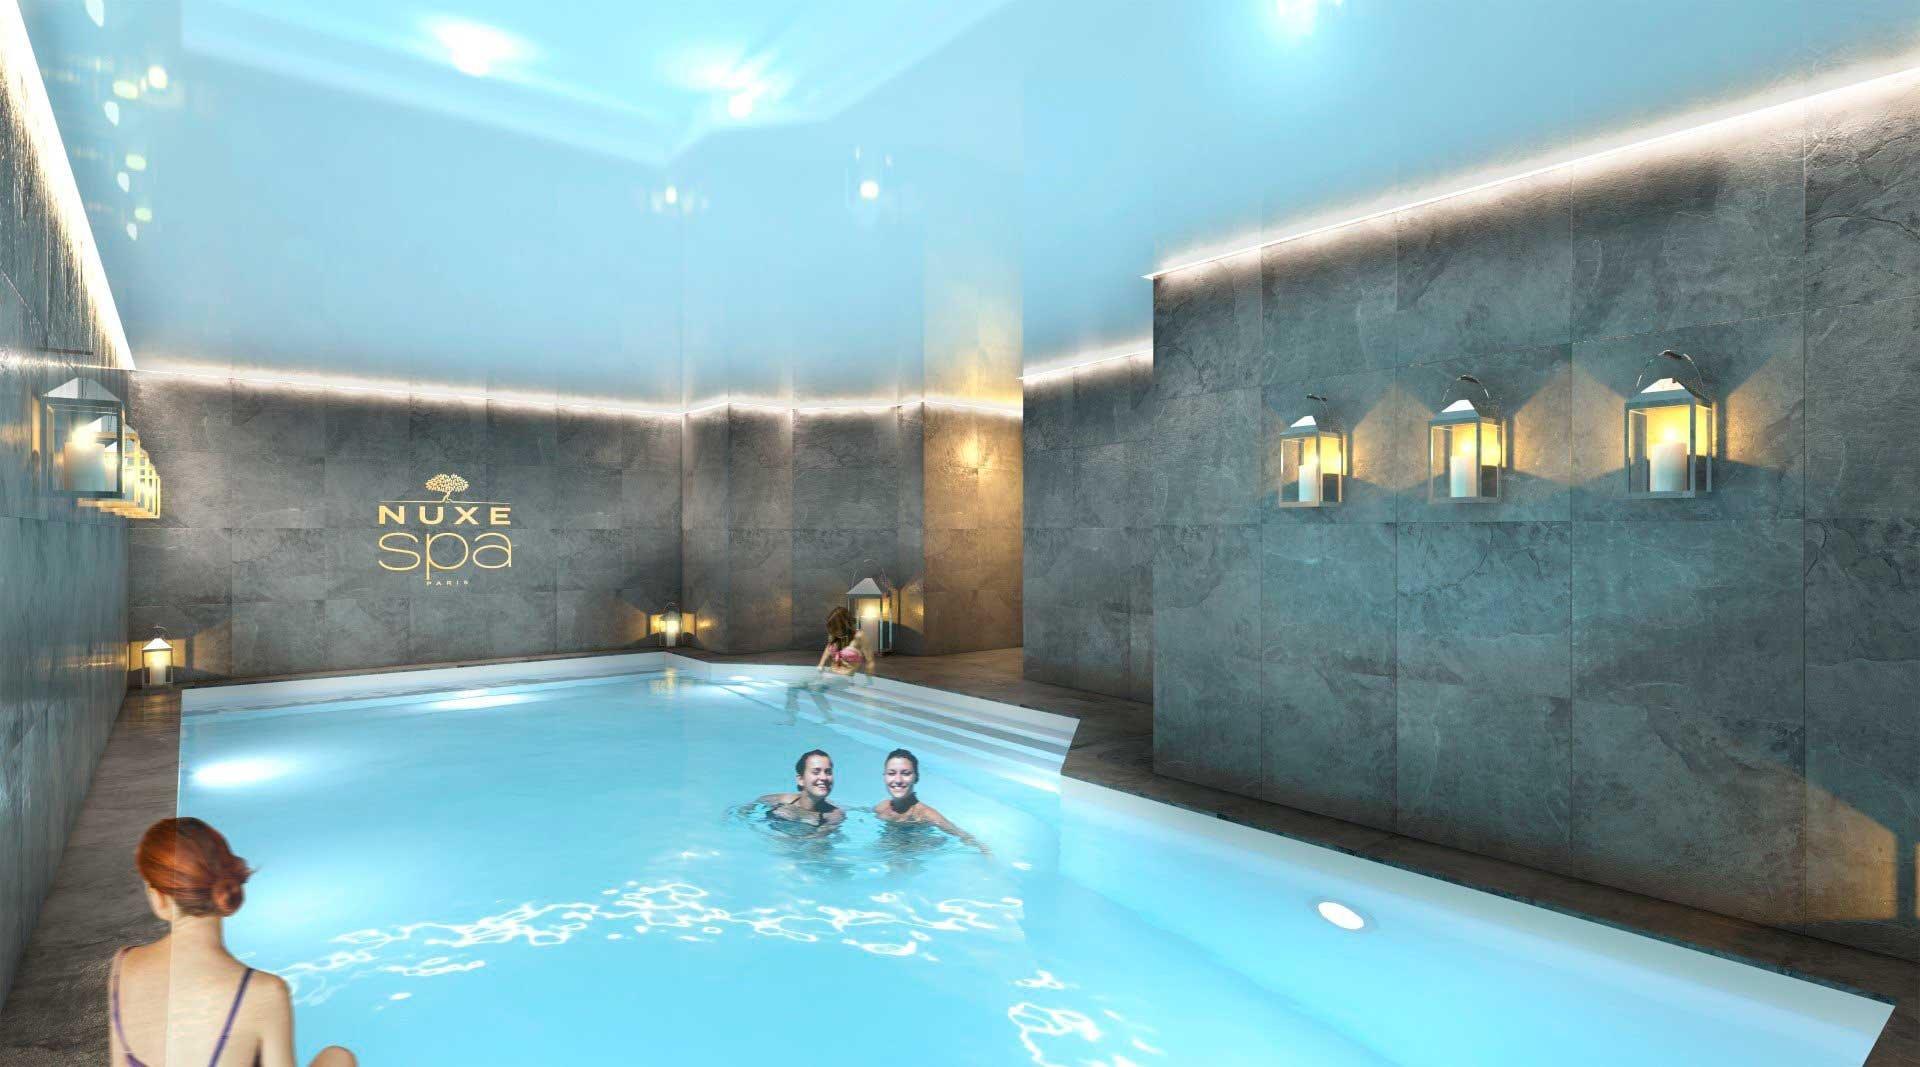 Araucaria Hotel & Spa**** - Spa NUXE